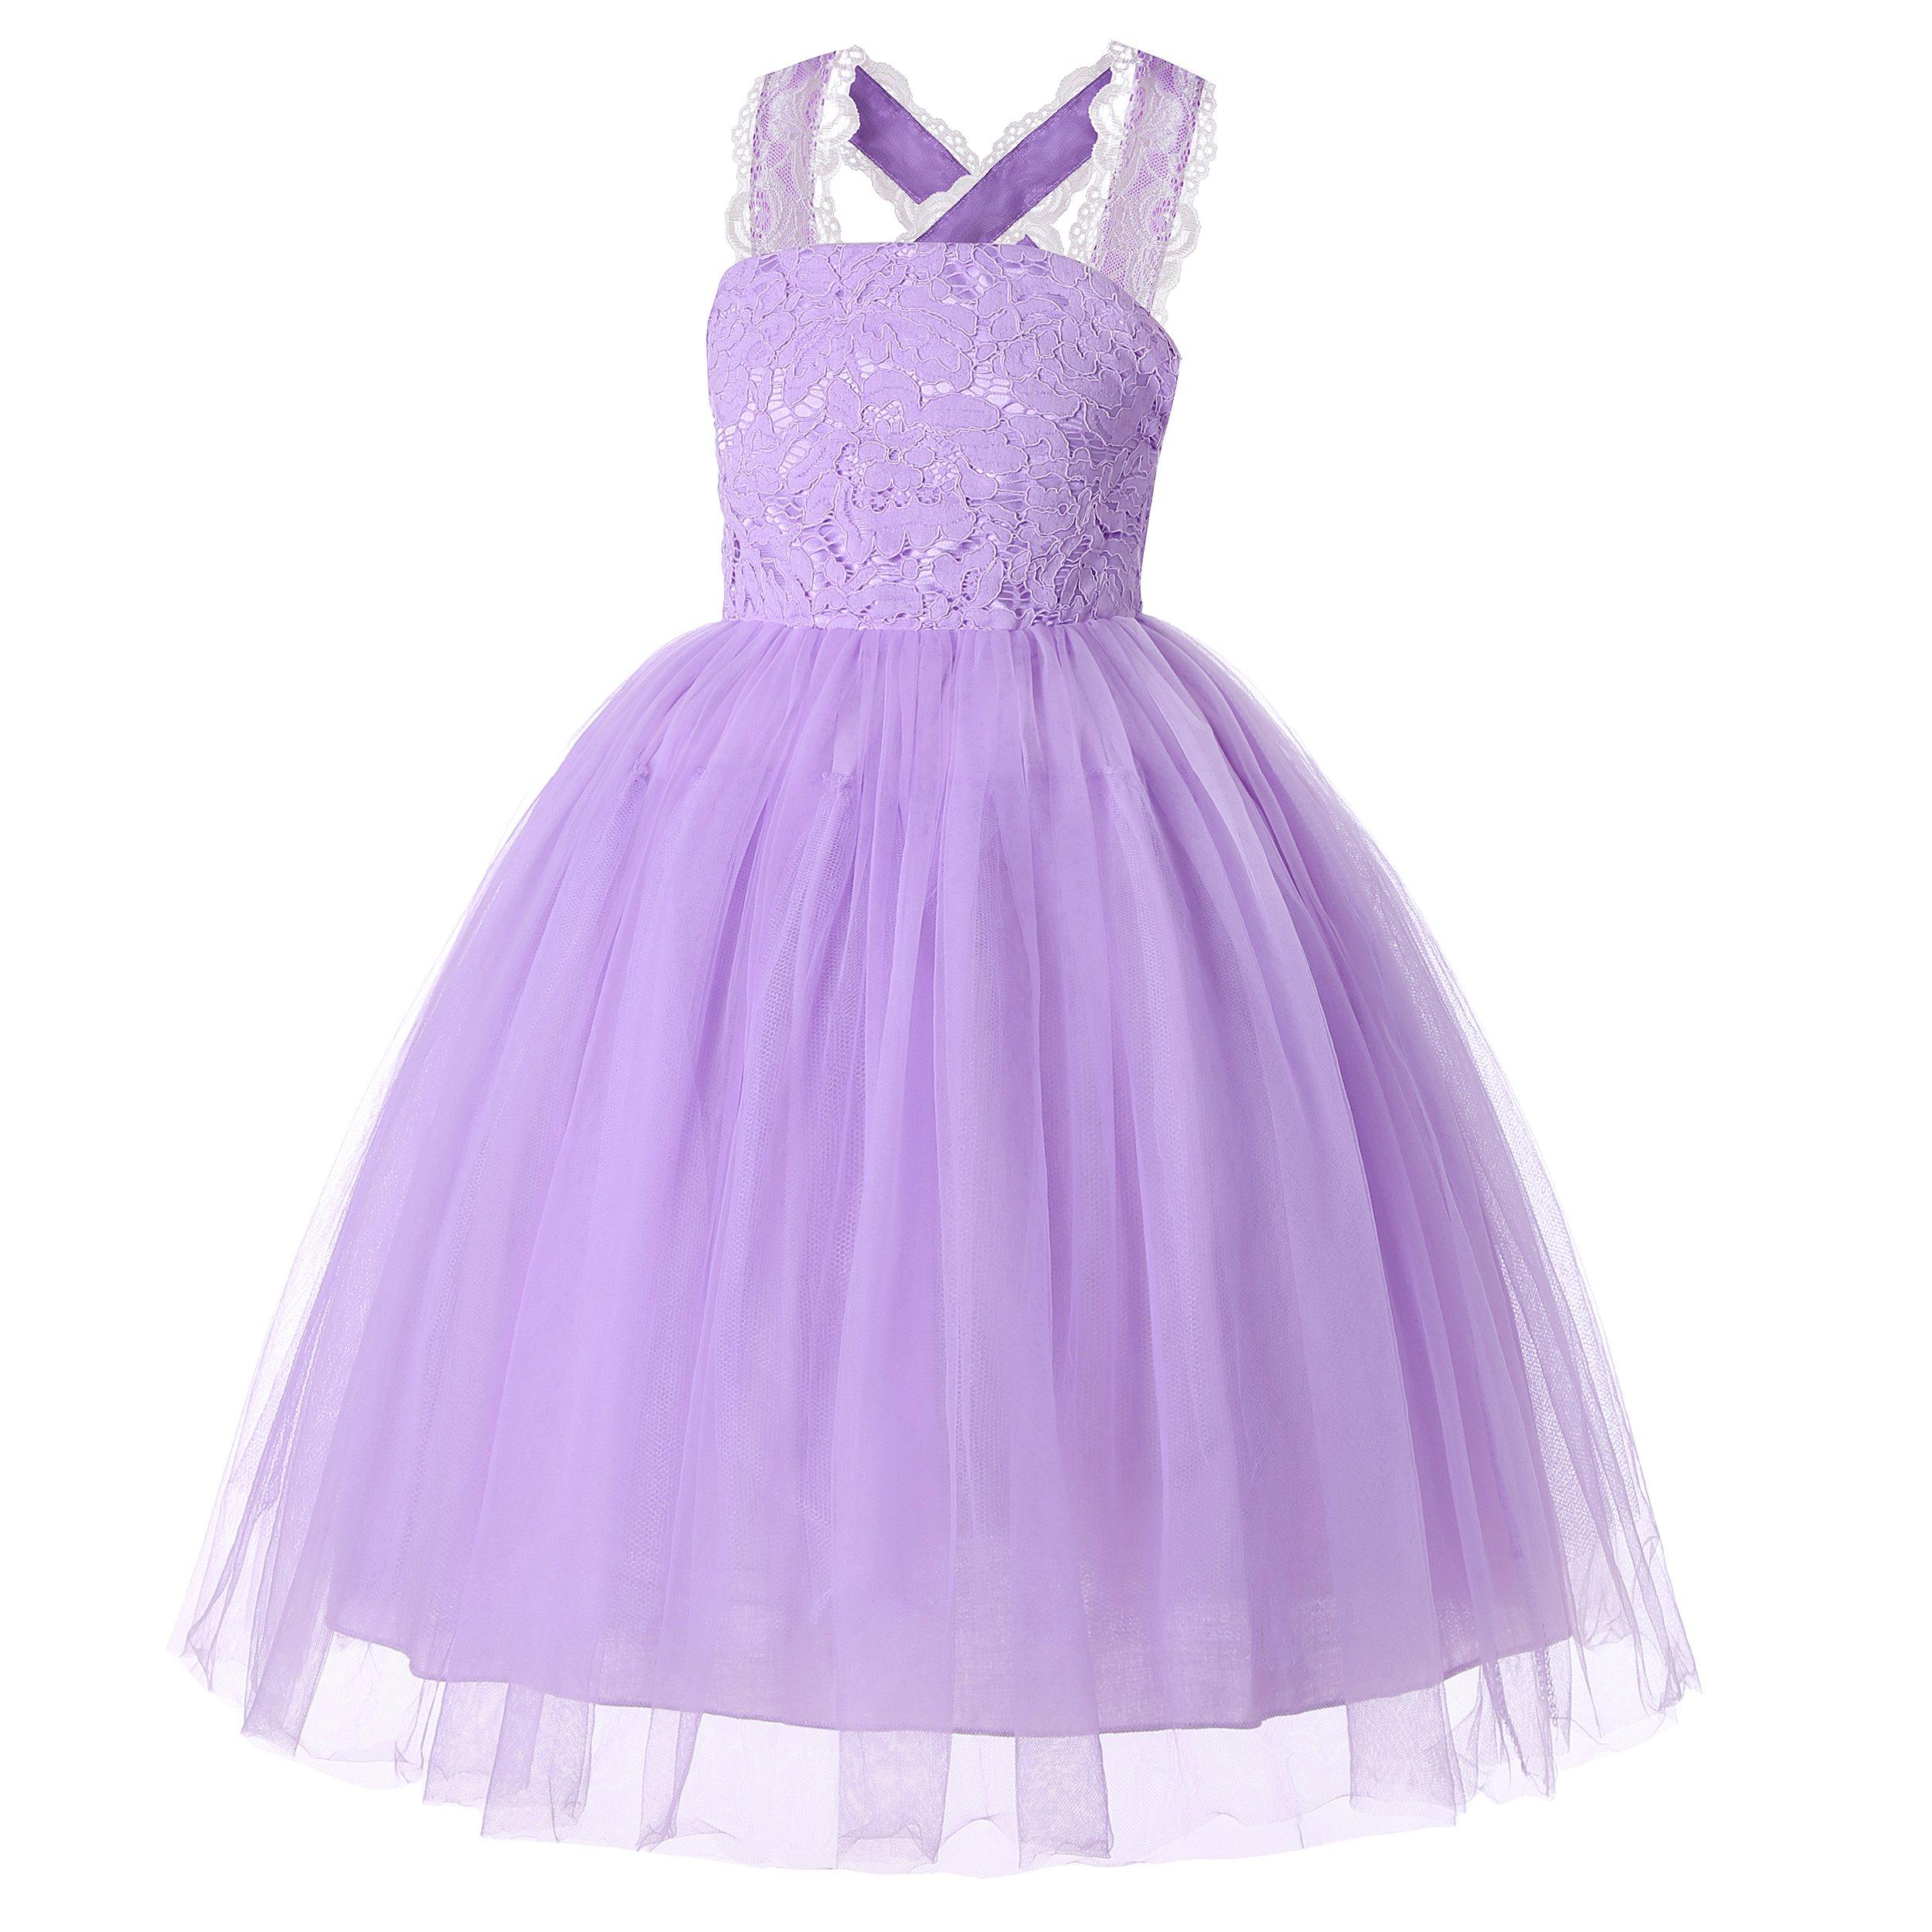 Dance Fairy Molliya Wedding Flower Girl Dress Lace Crossed Back Tulle Fluffy Dress for Party(Purple,10)